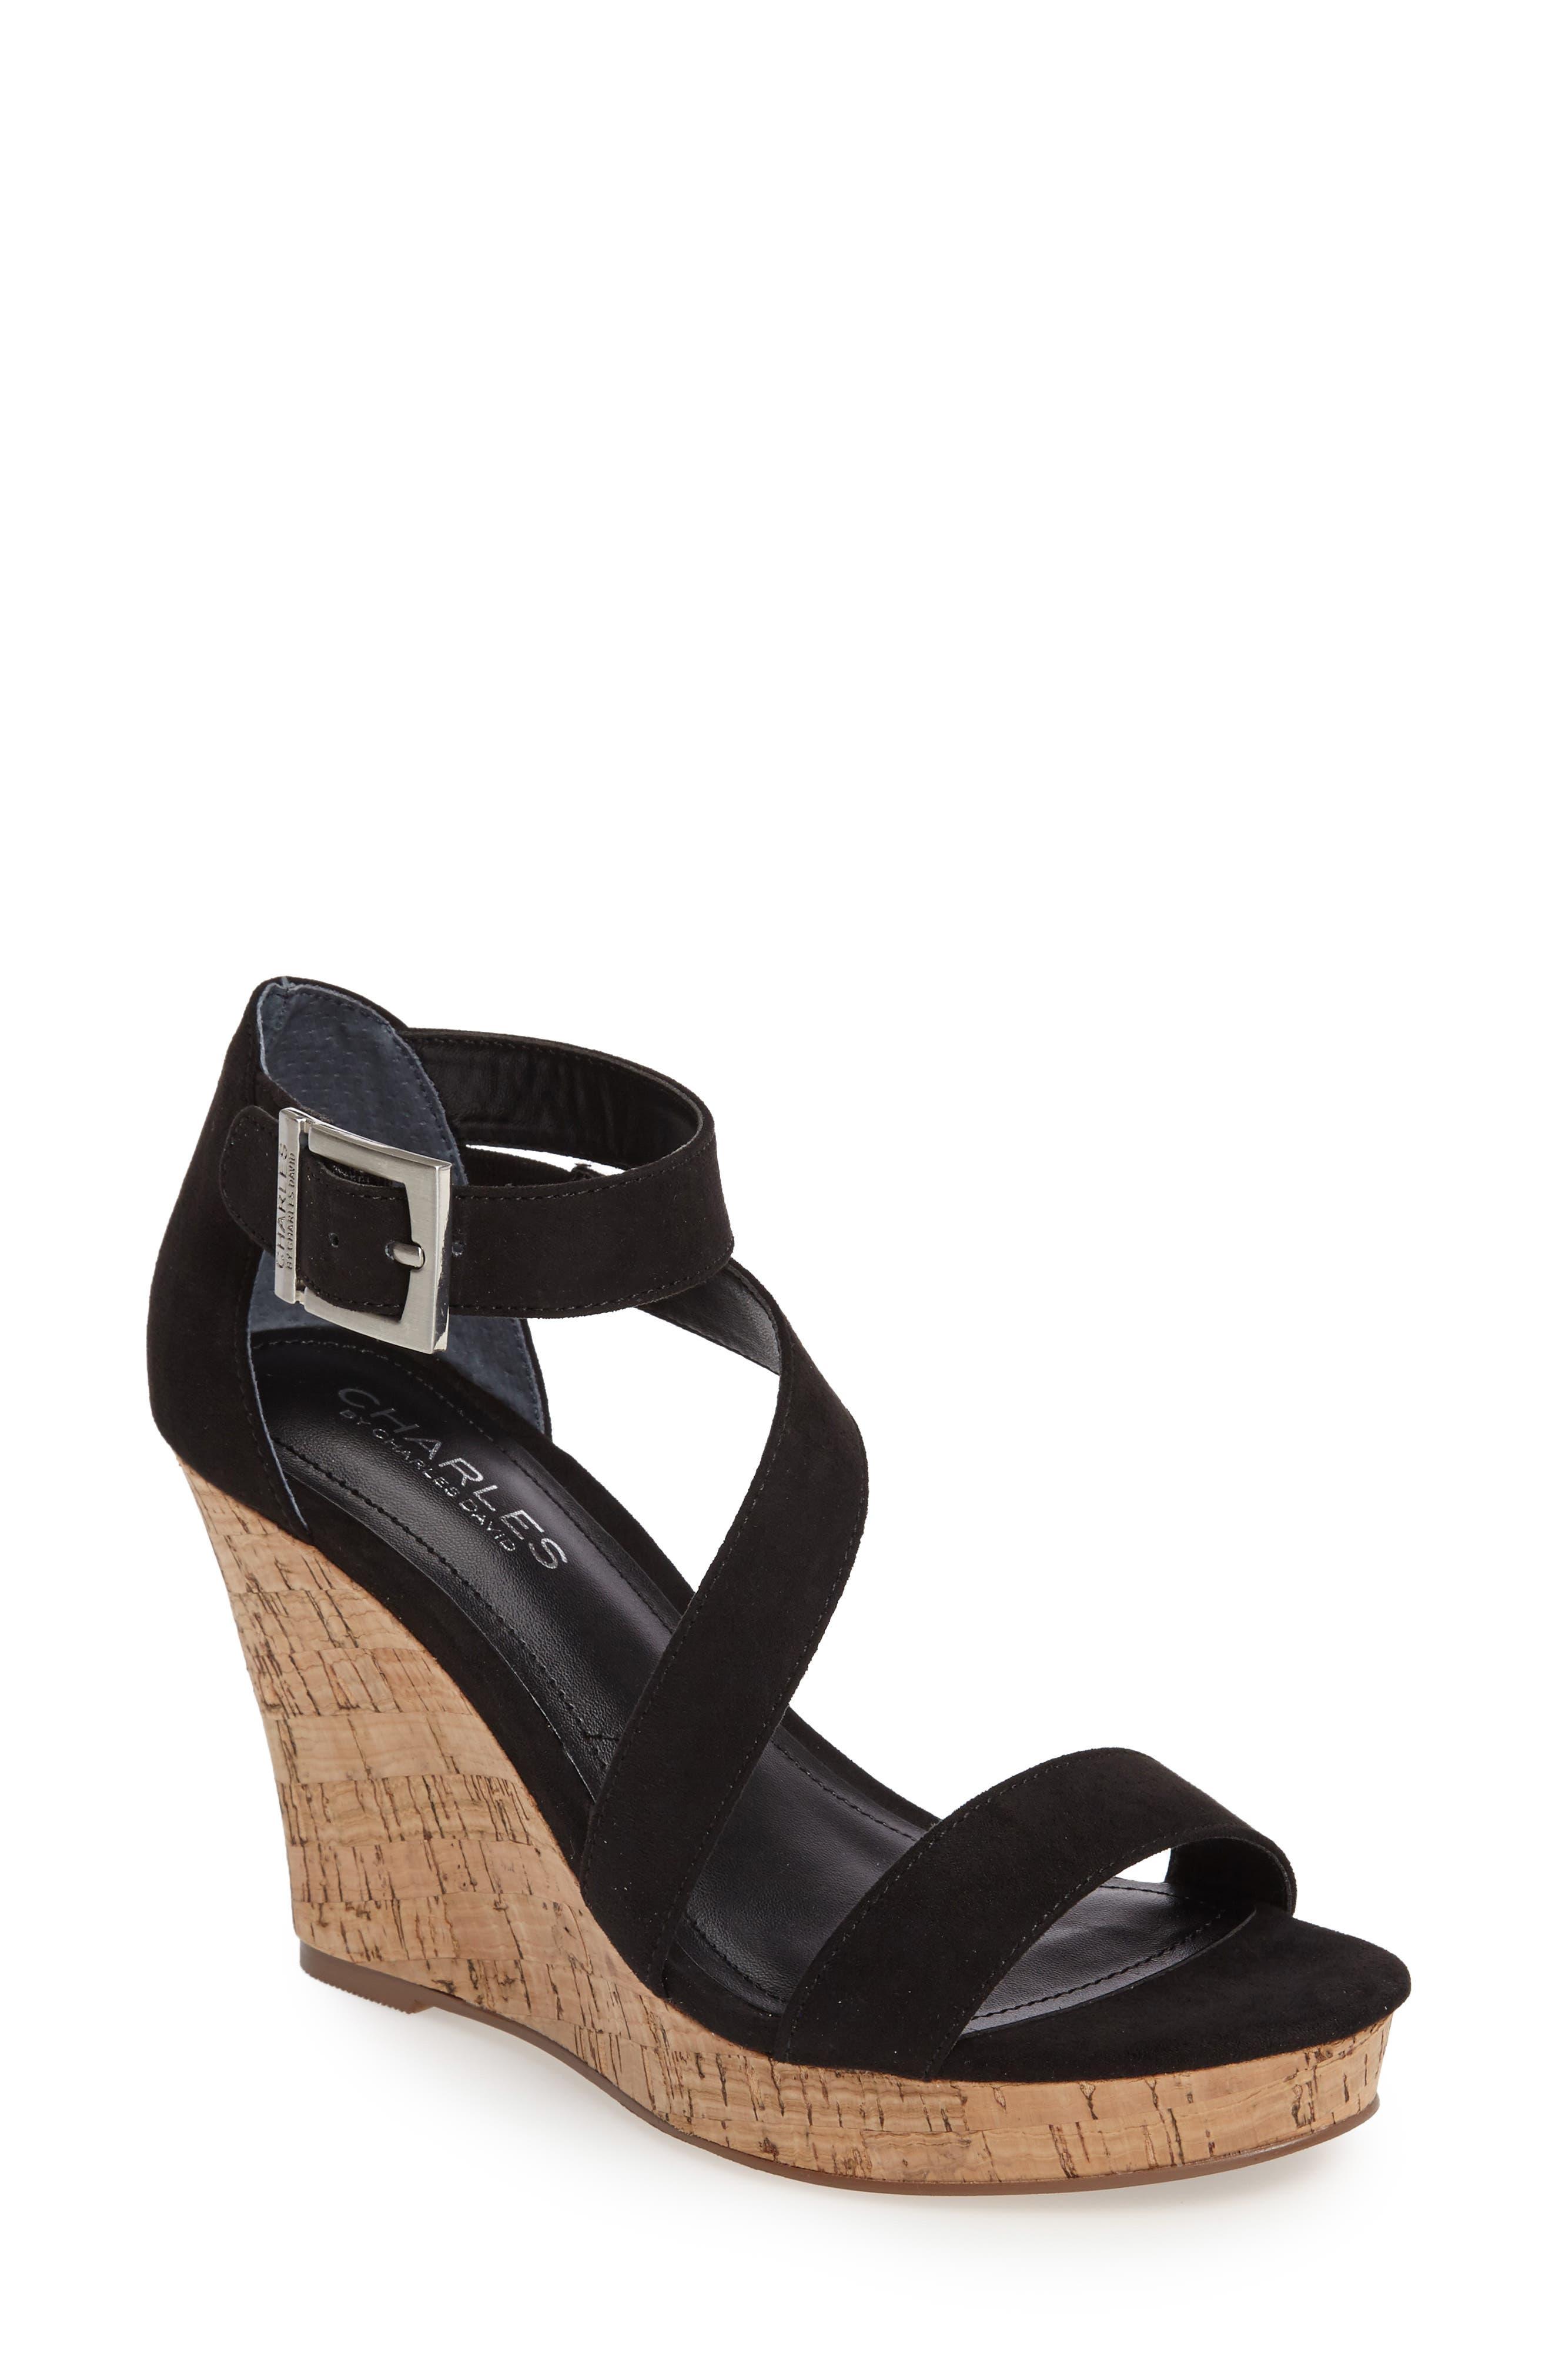 charles by charles david leanna wedge sandal